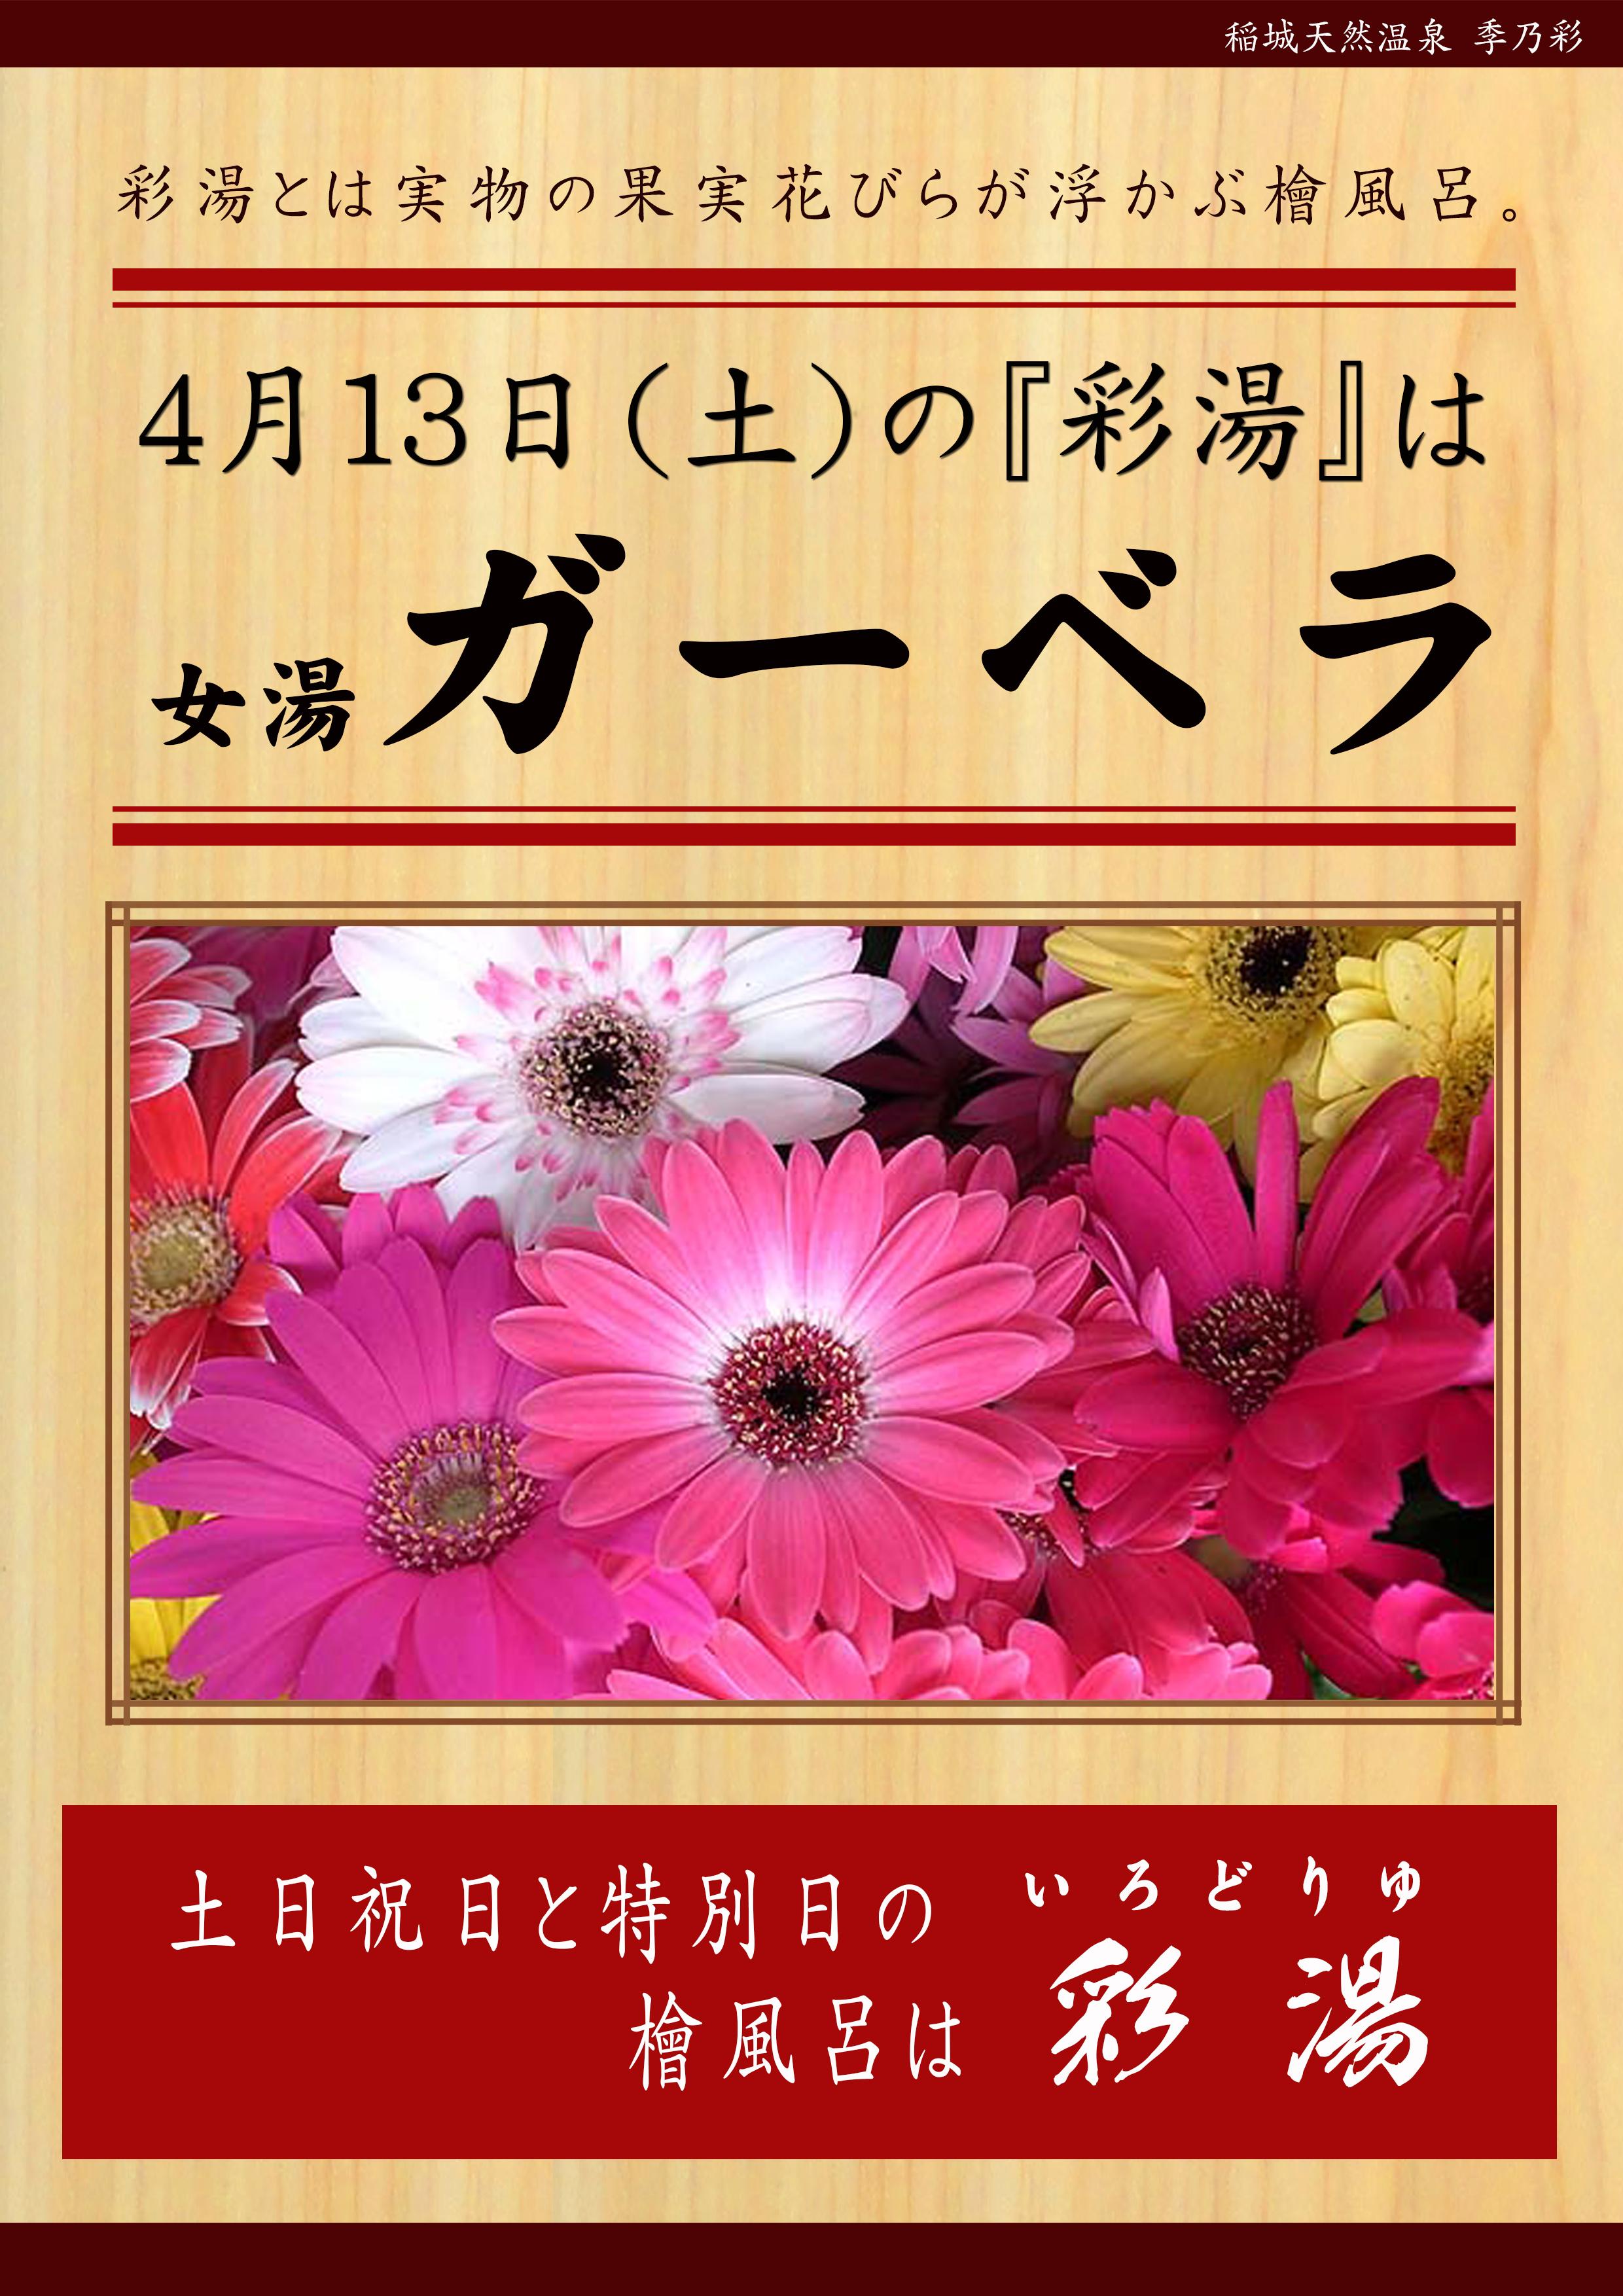 20190413POP イベント 彩湯 女湯 ガーベラ